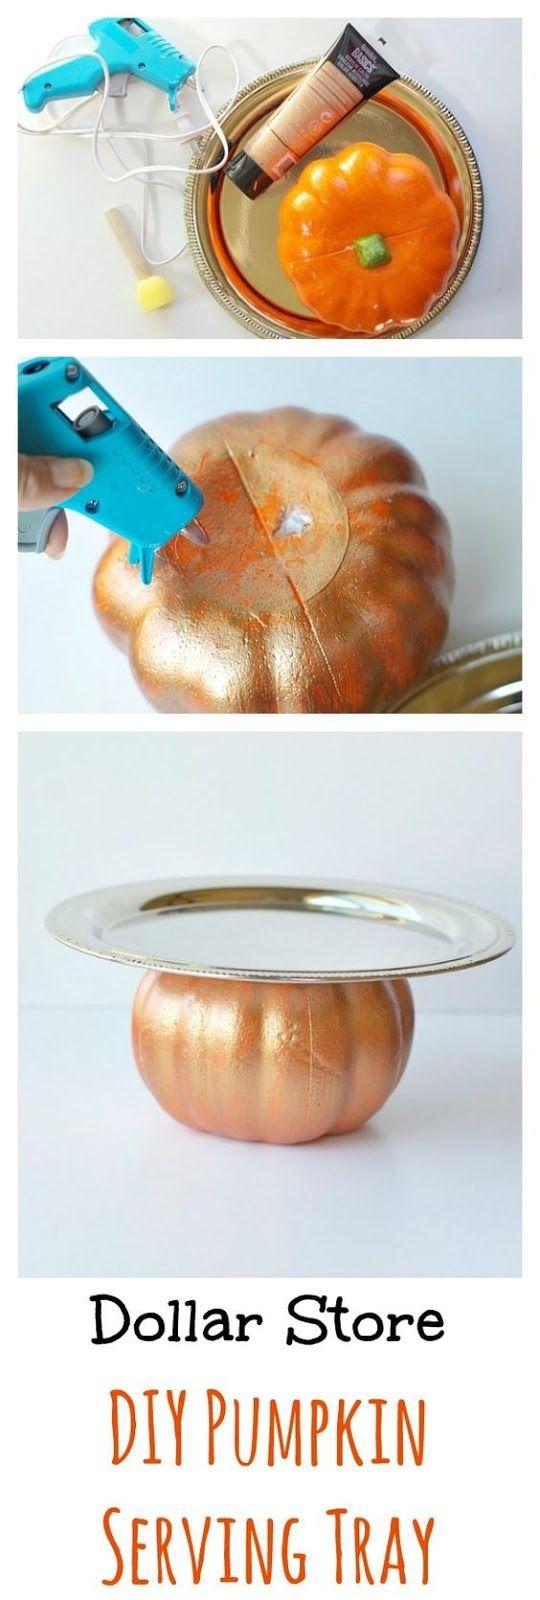 20 Thanksgiving Decorations DIY Ideas